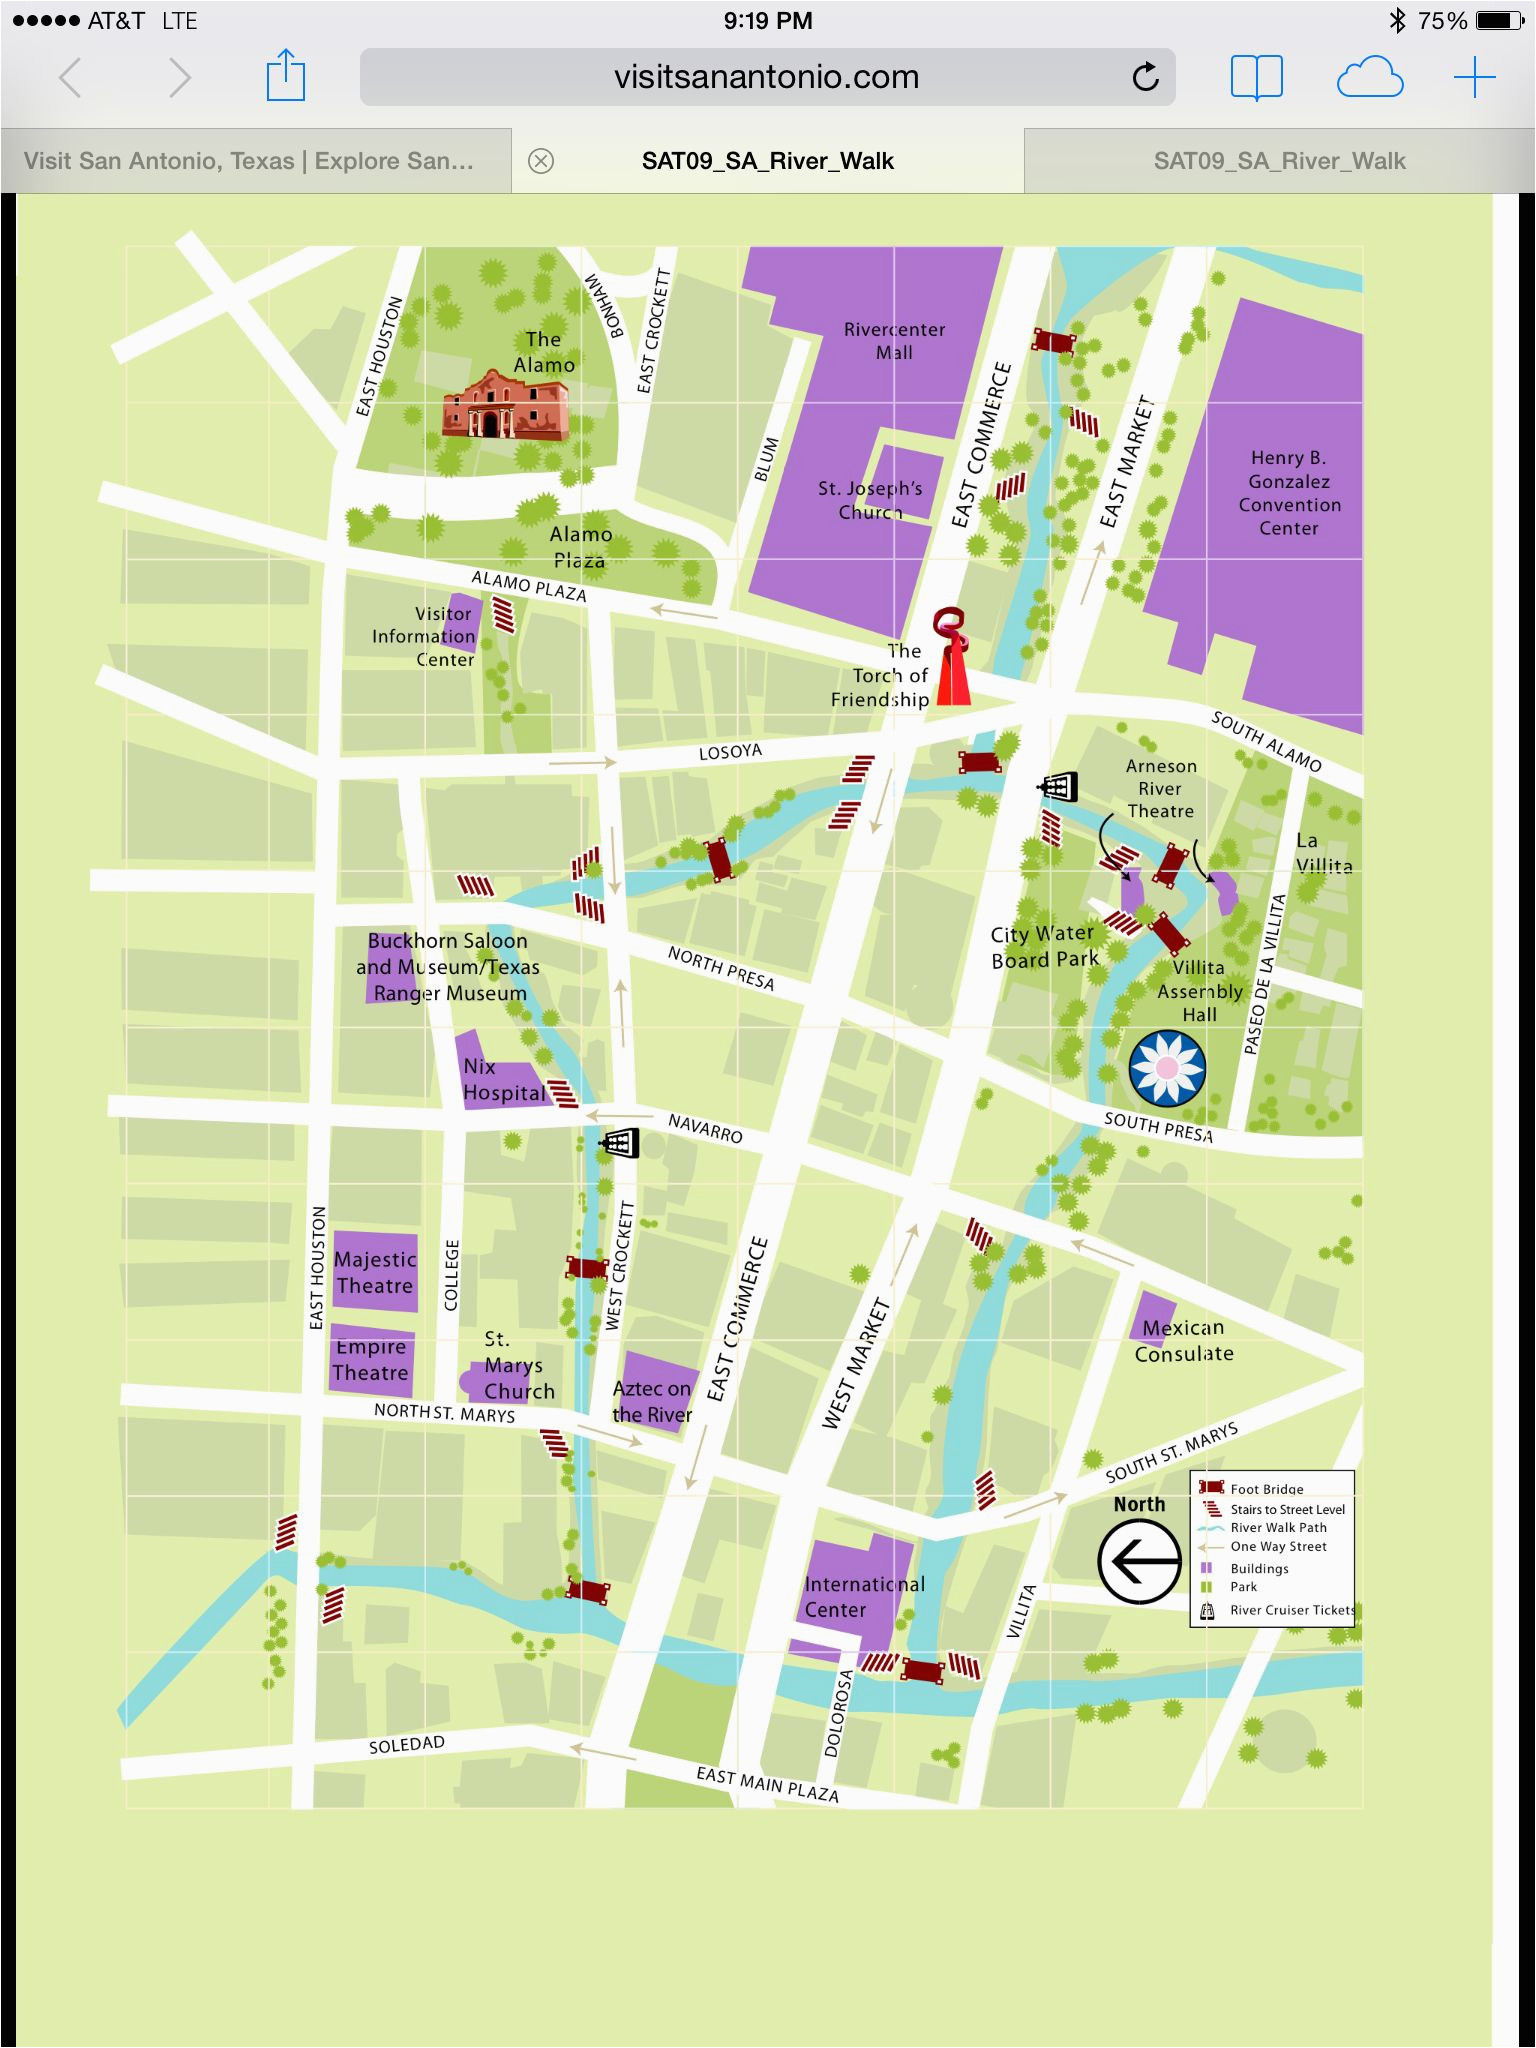 riverwalk map san antonio in 2019 san antonio texas riverwalk